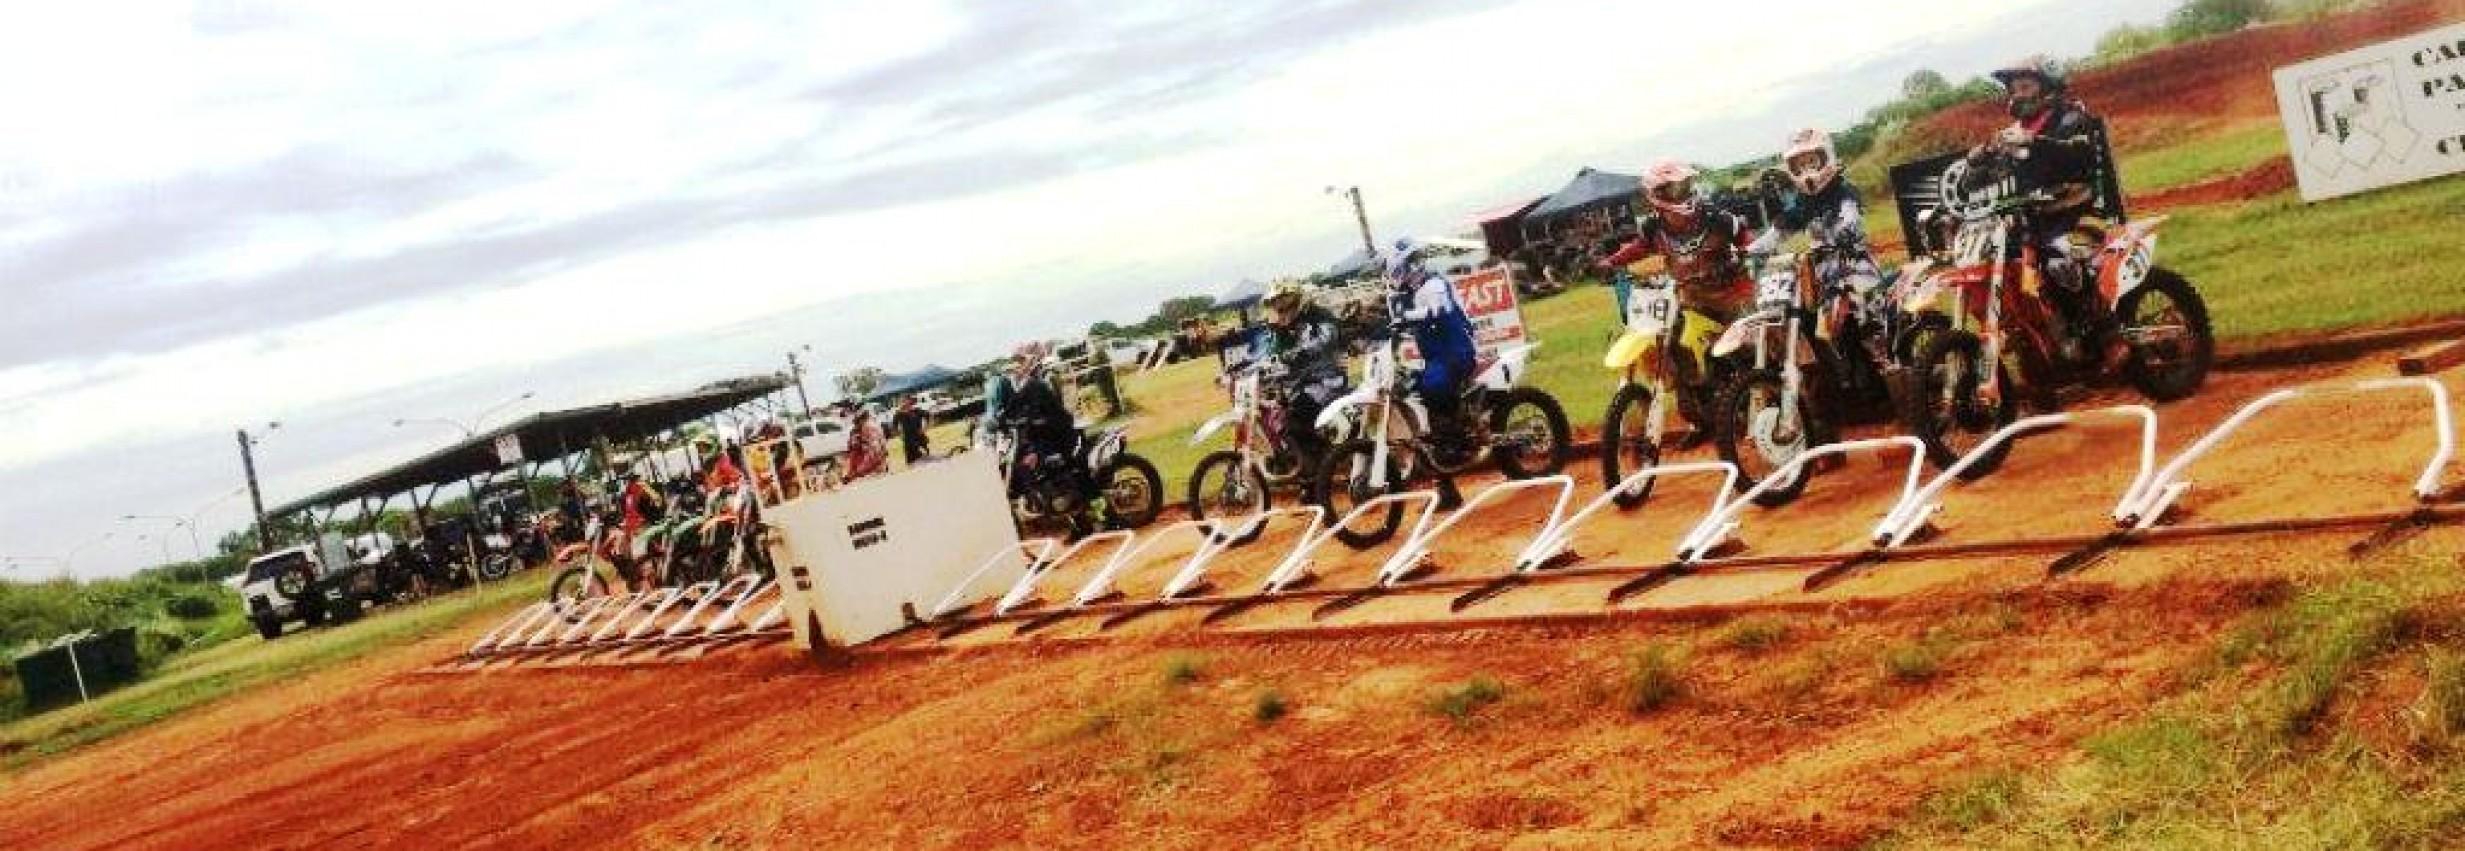 Broome Motocross Track